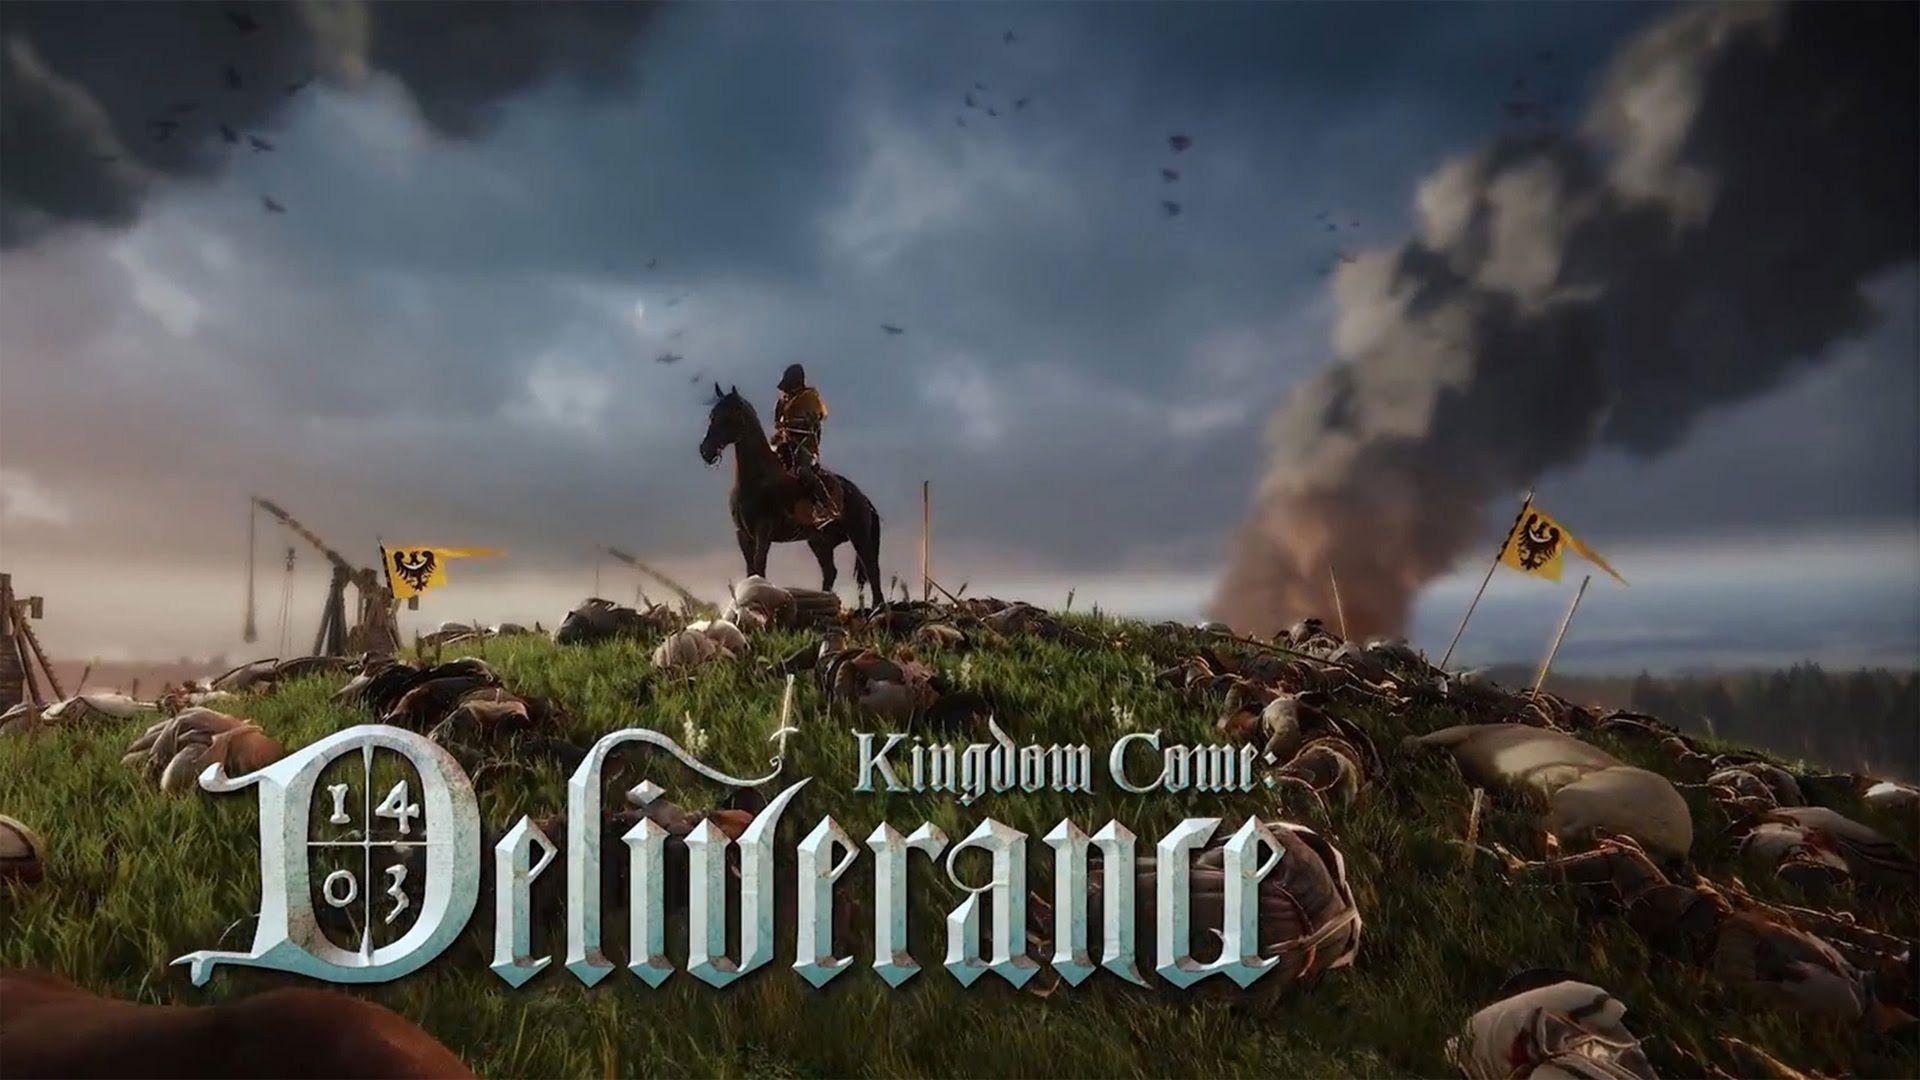 Kingdom Come: Deliverance CD Key +Crack PC Game Free Download